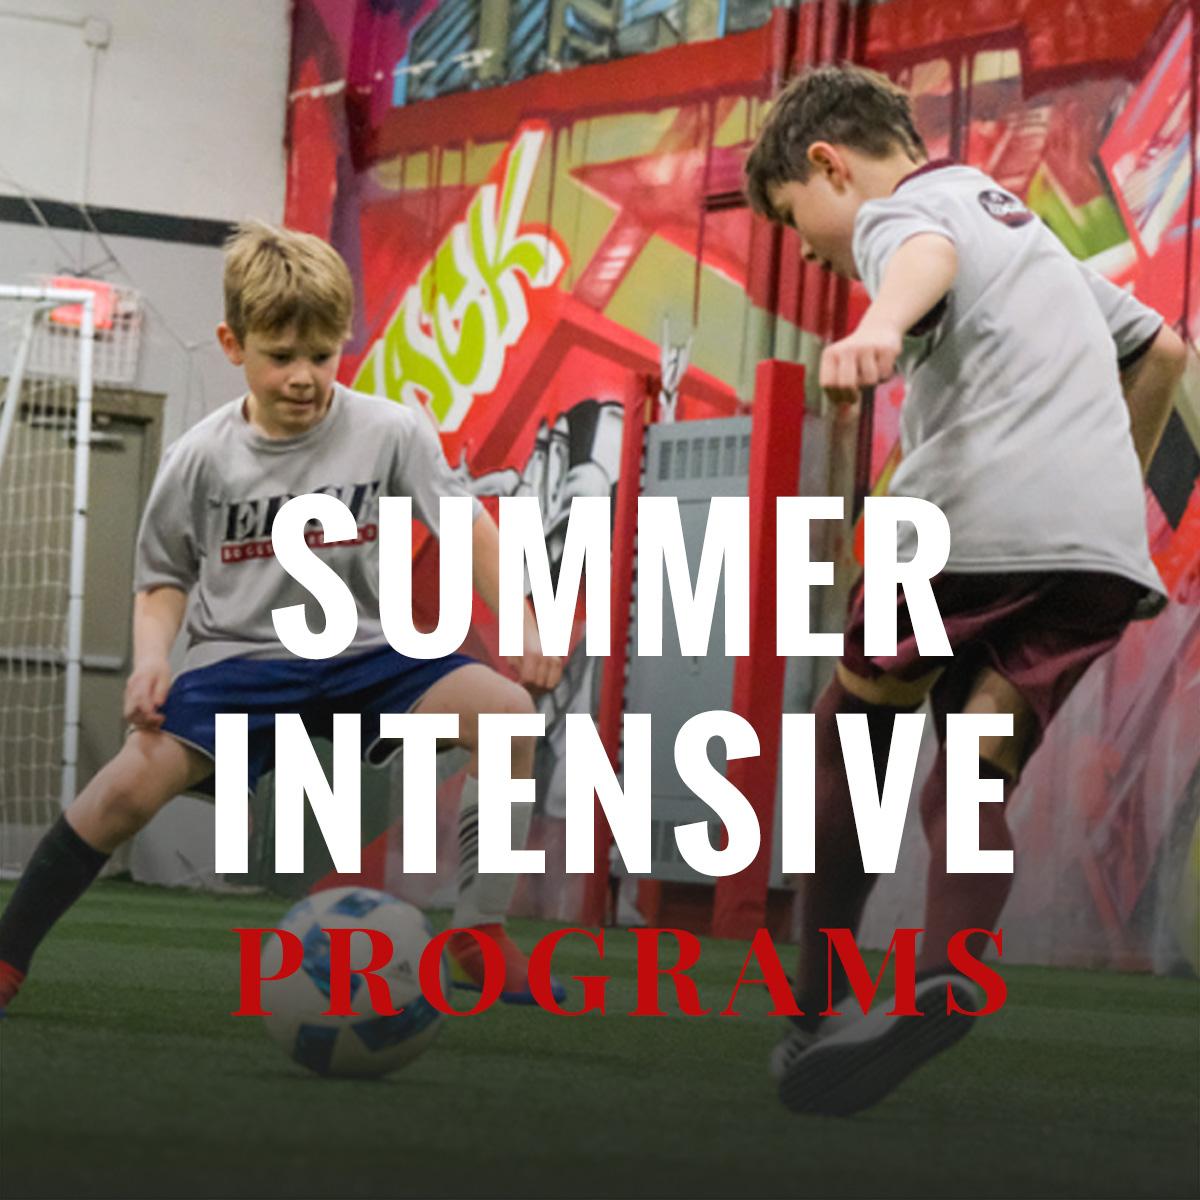 BC-summerintensive